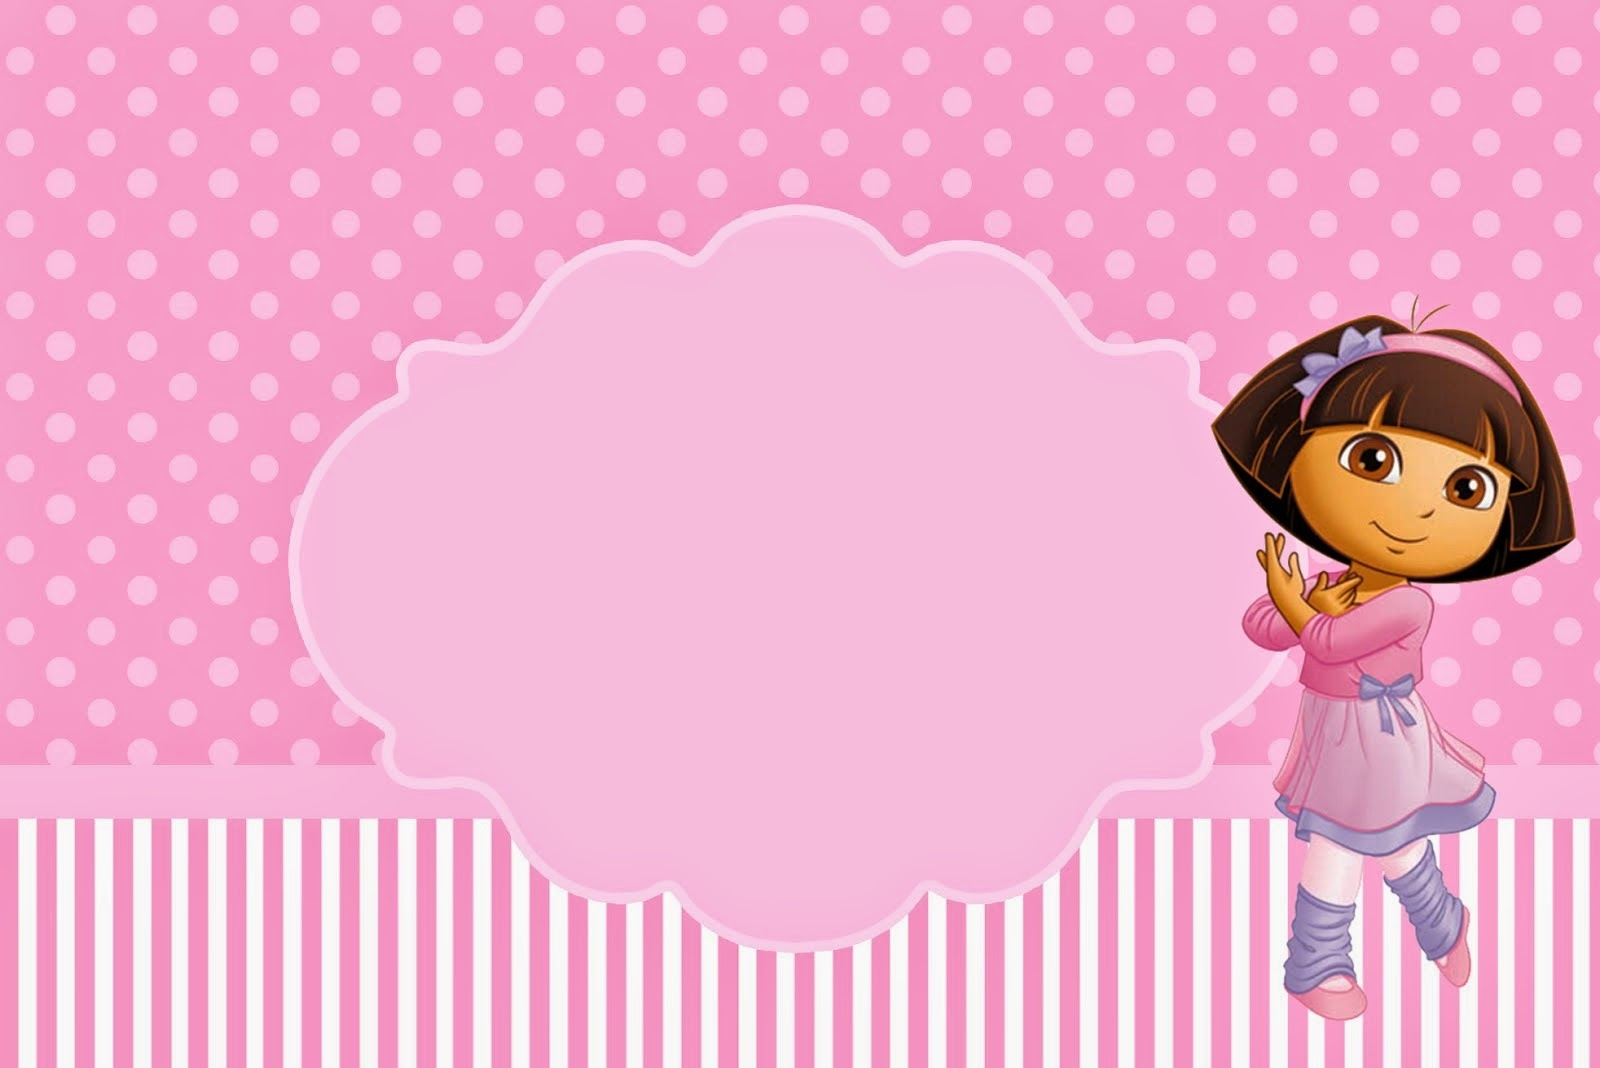 Dora Dancing Ballet: Free Printable Invitations. - Oh My Fiesta! In - Dora The Explorer Free Printable Invitations